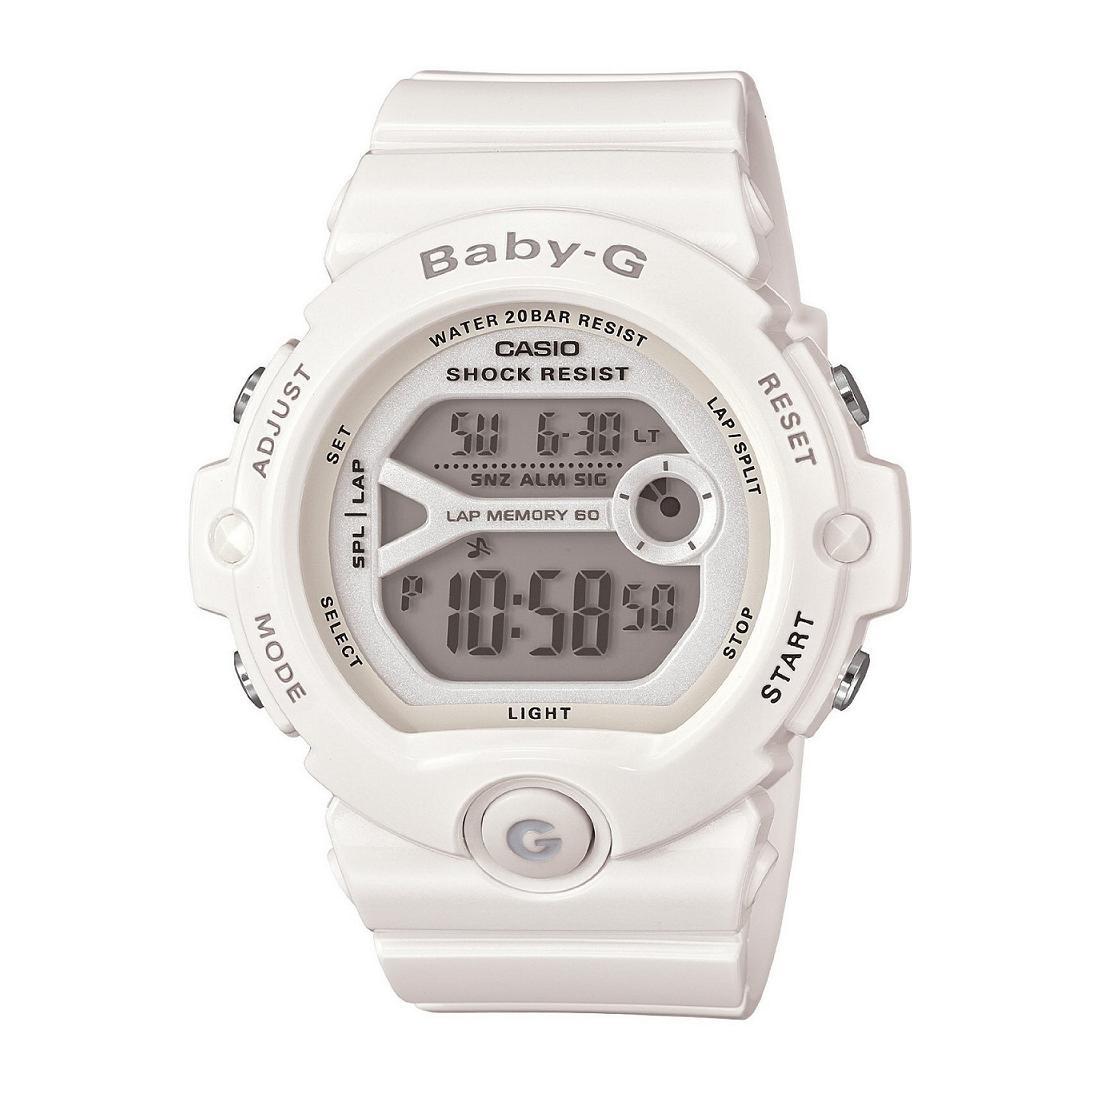 Casio BabyG BG69037B 1